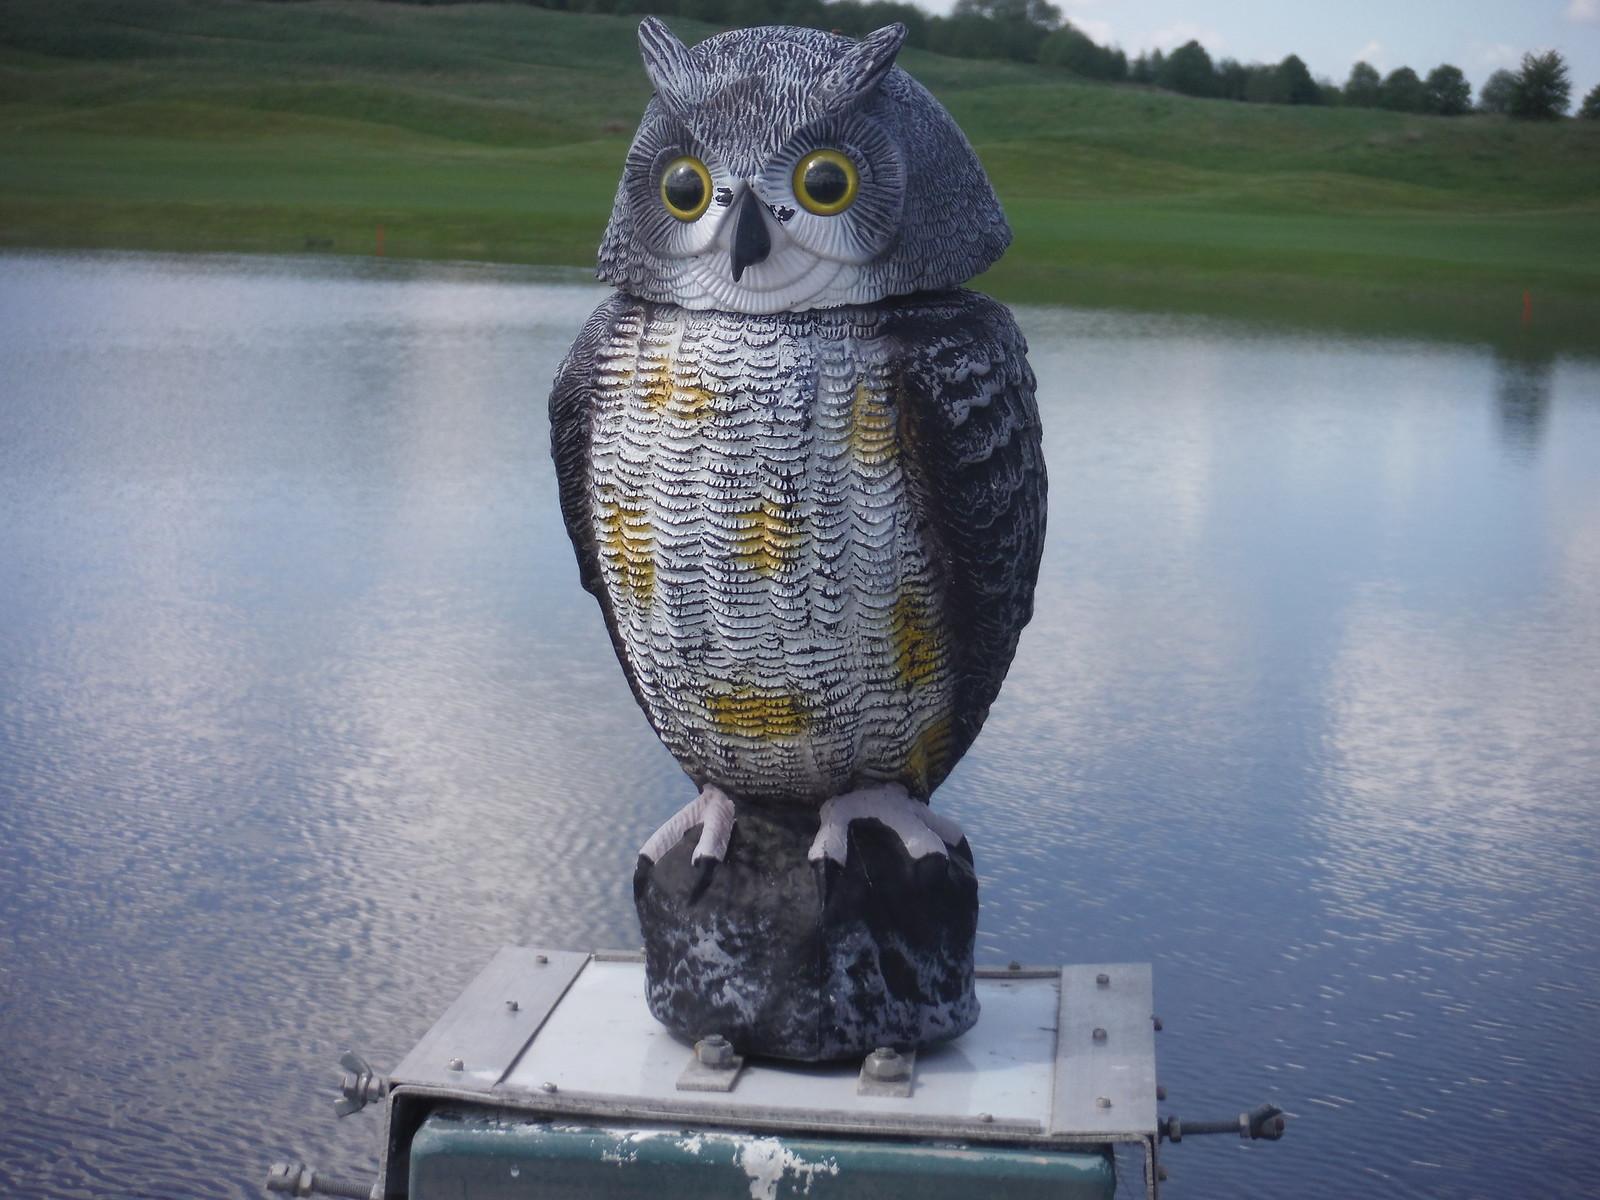 Owl on Bridge in grounds of Oxfordshire Golf Club SWC Walk 190 - Thame Circular